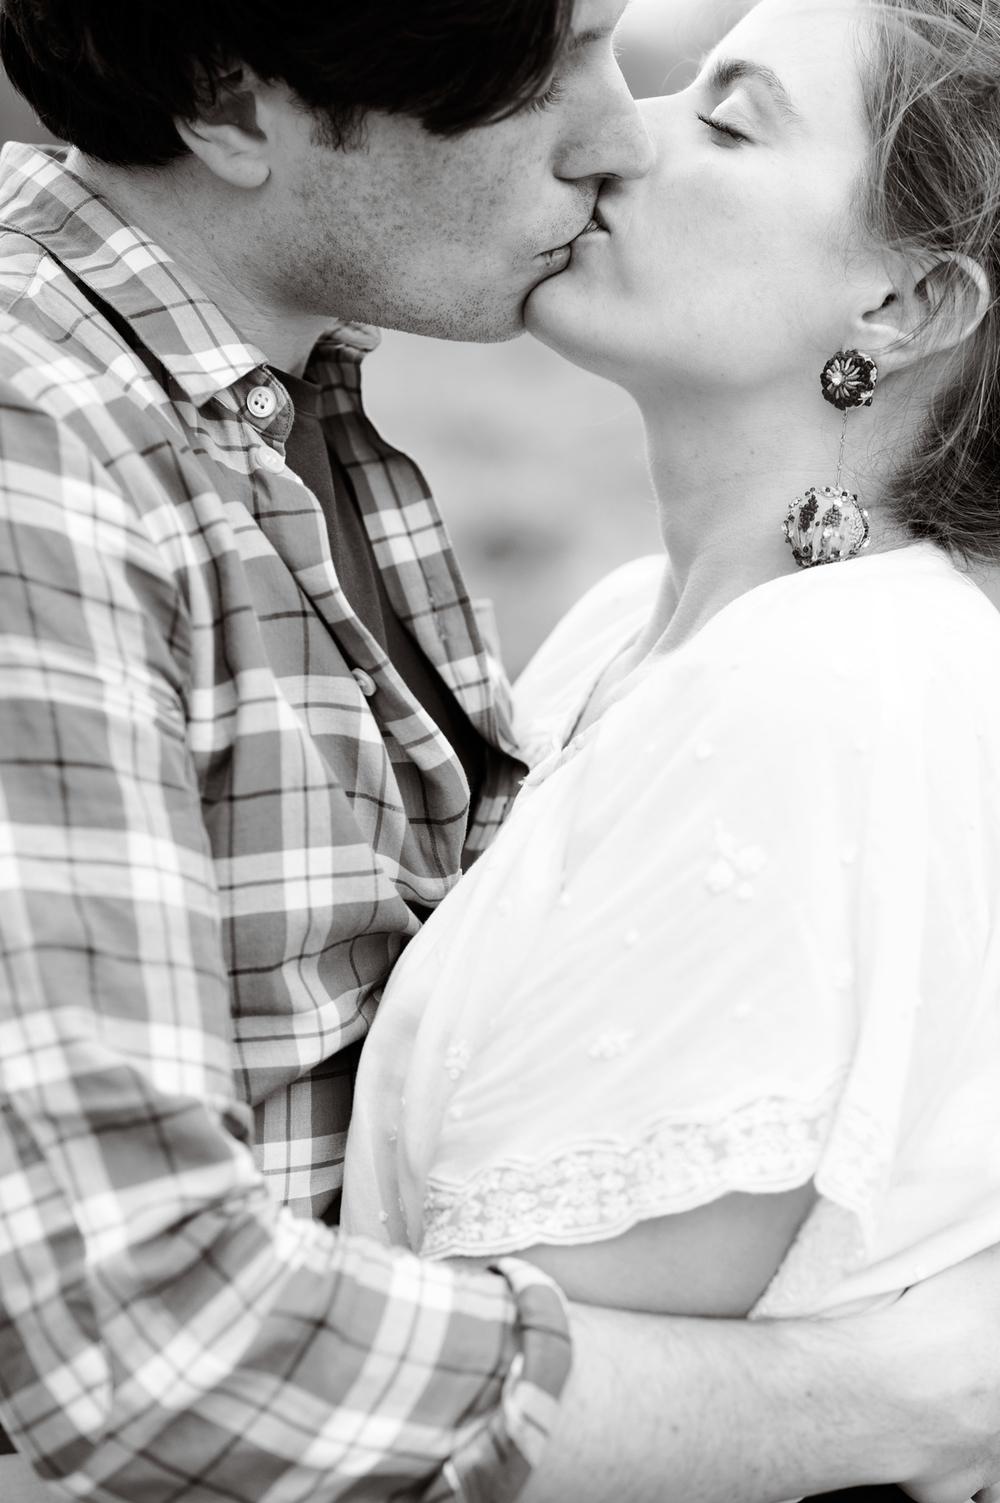 Couples-003.jpg